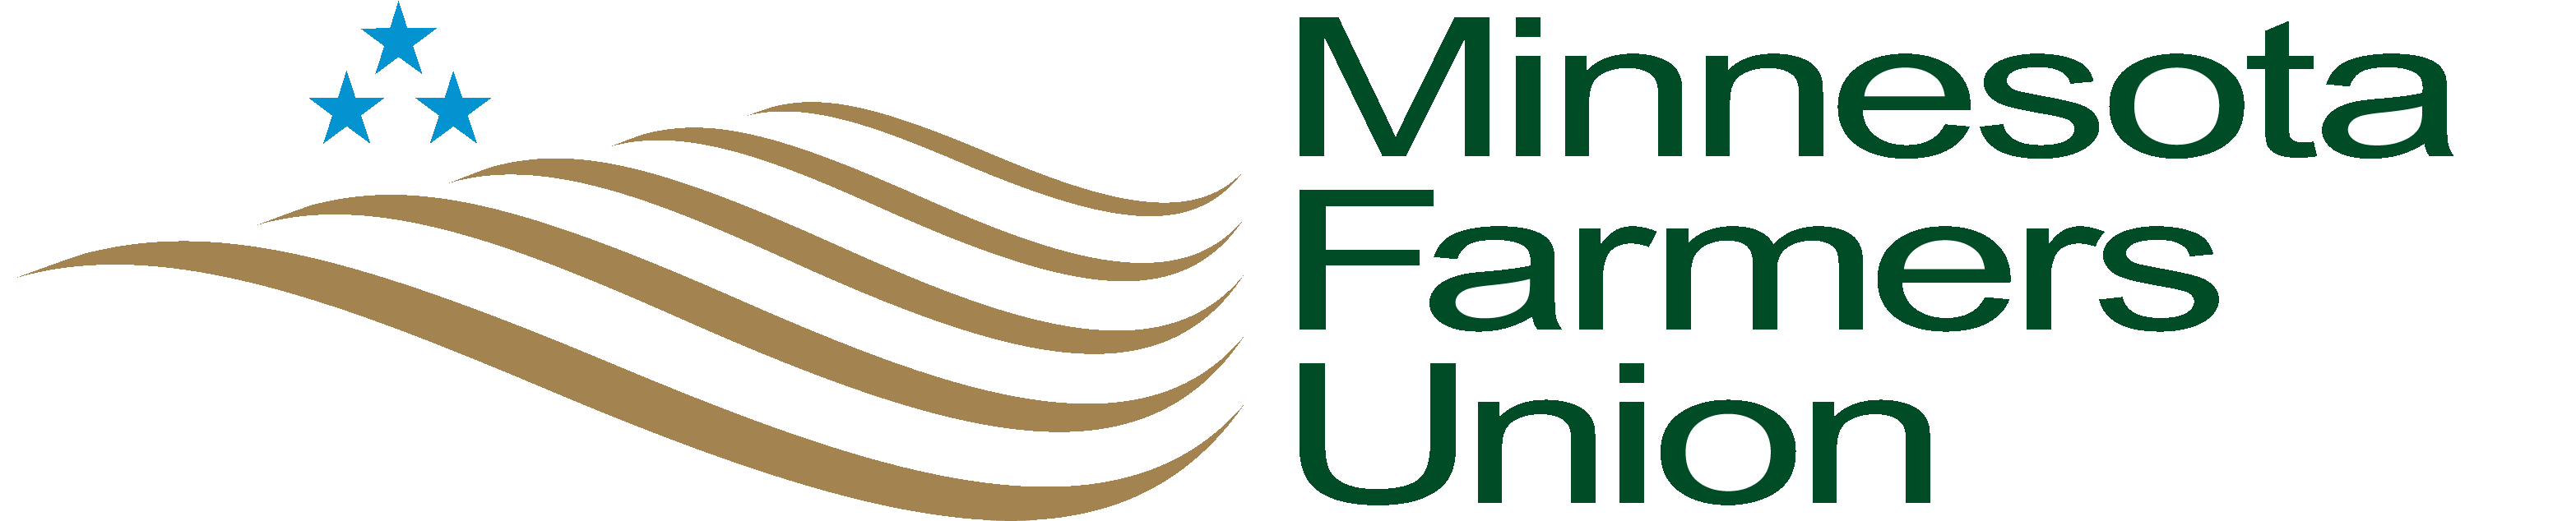 Minnesota Farmers Union logo